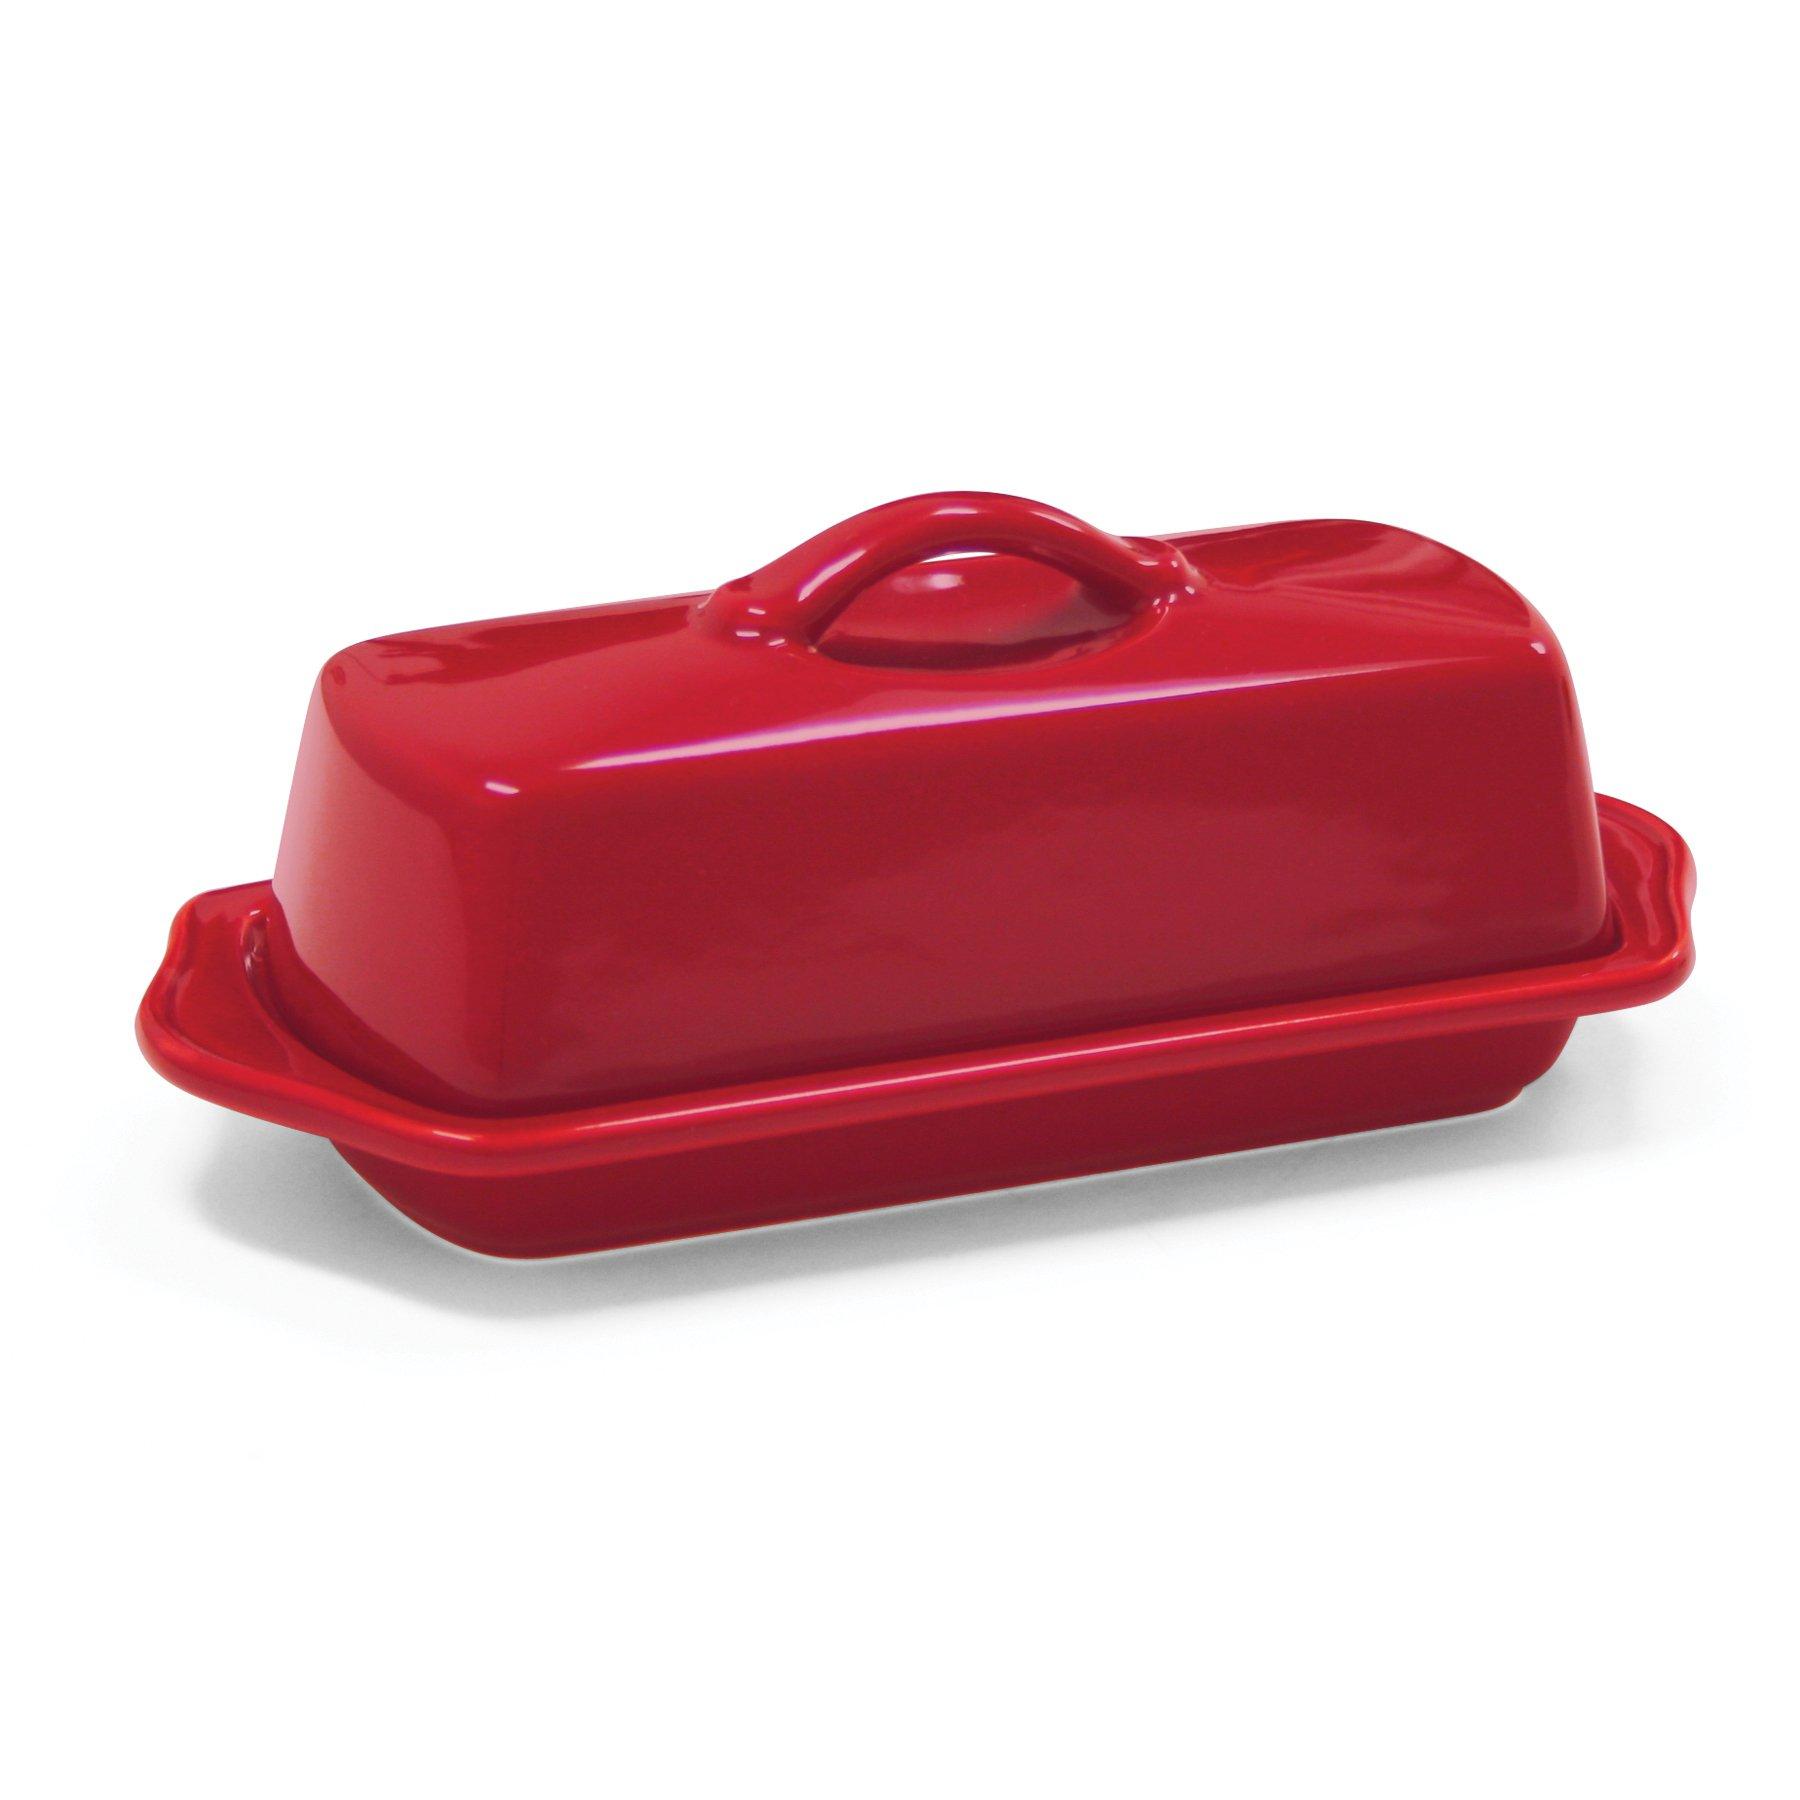 Chantal 93-TVBD-1 RR Large Butter Dish, True Red